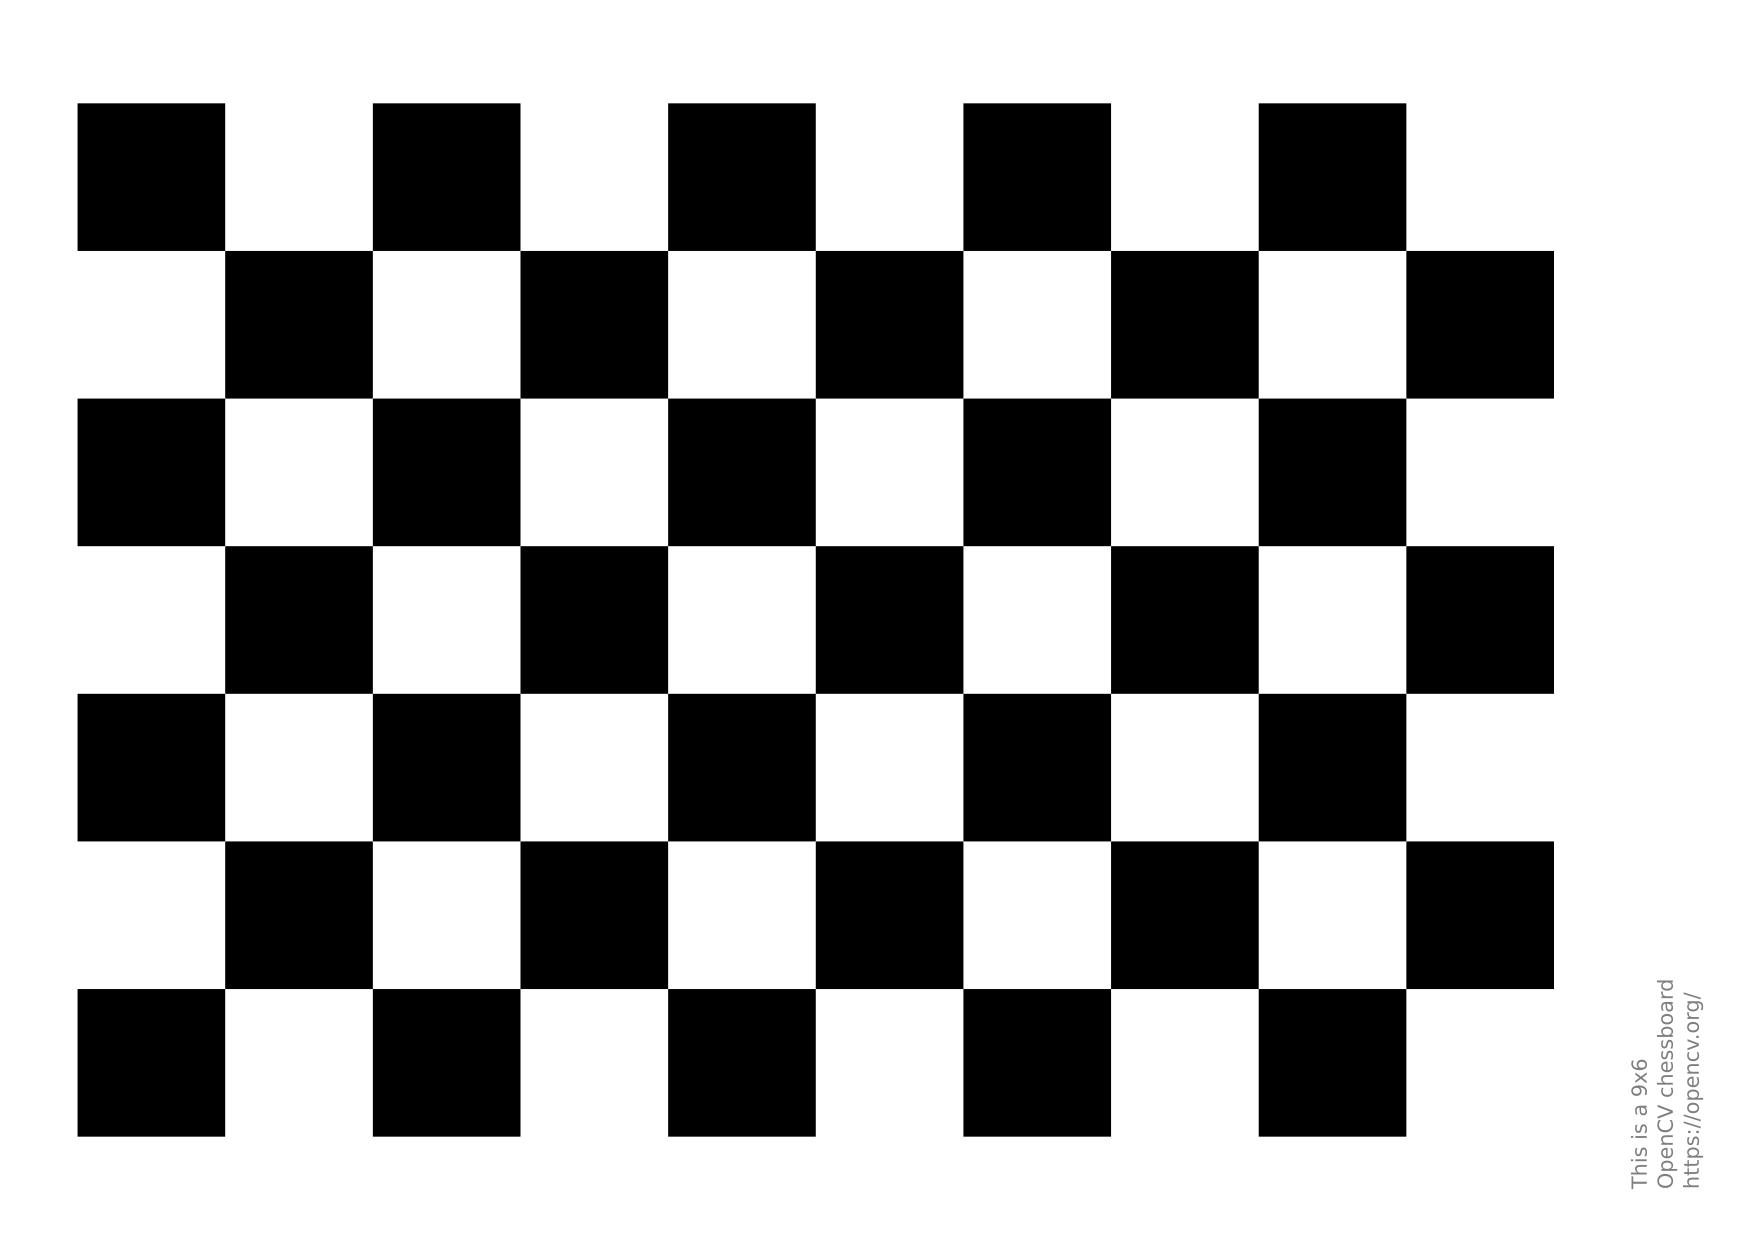 https://raw.githubusercontent.com/opencv/opencv/master/doc/pattern.png